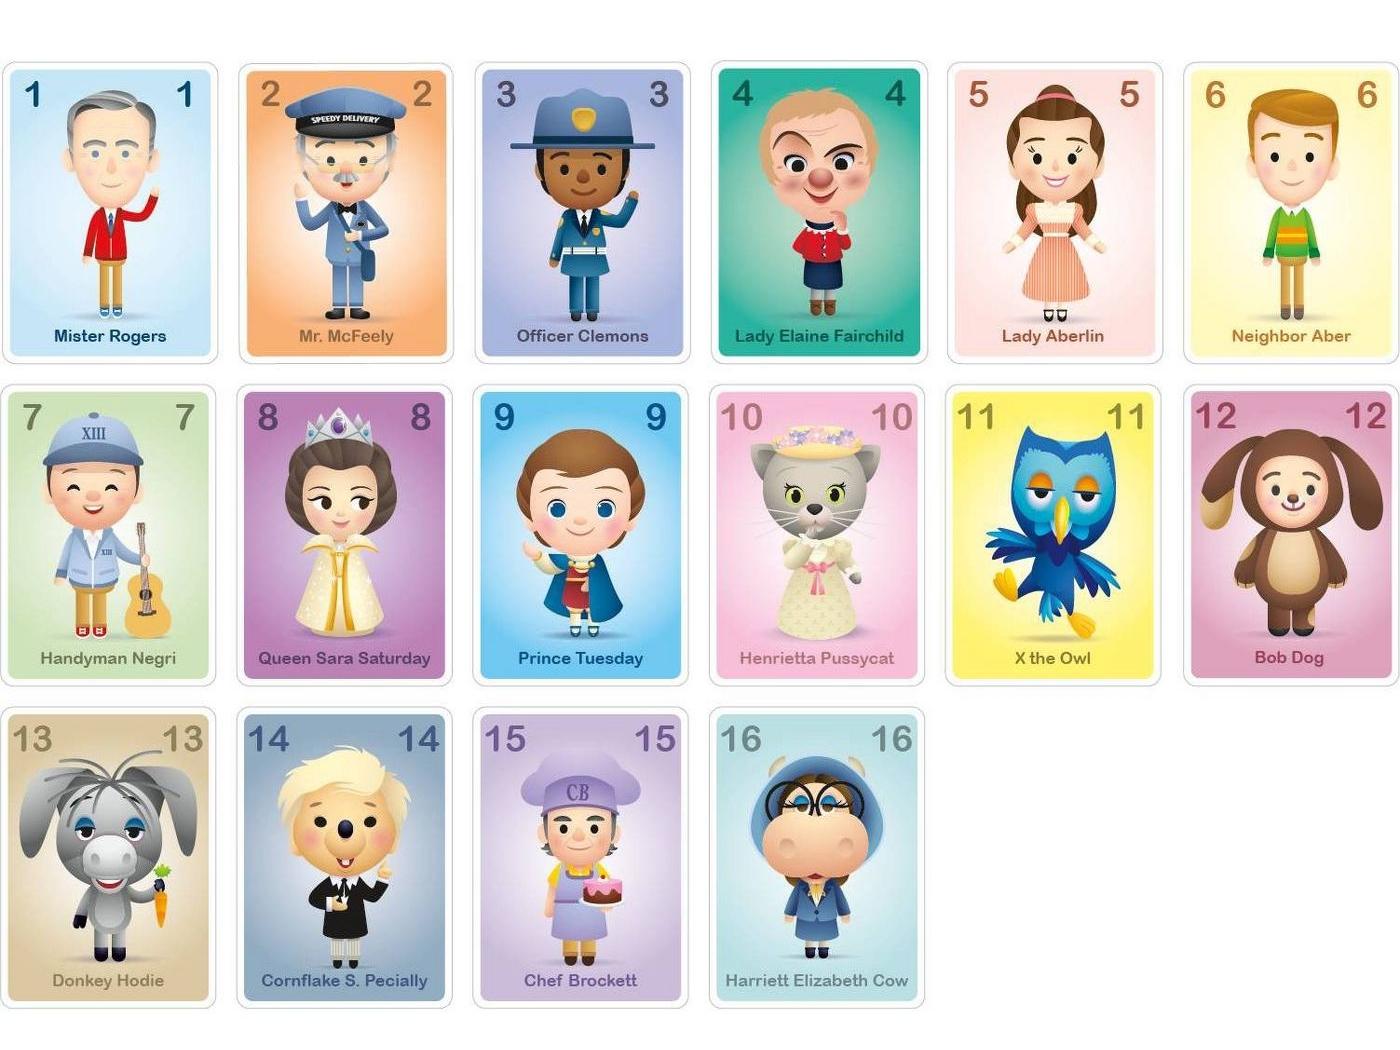 Mister Rogers' Neighborhood Game card game board game game design mister rogers childrens illustration cute character design adobe illustrator illustration art